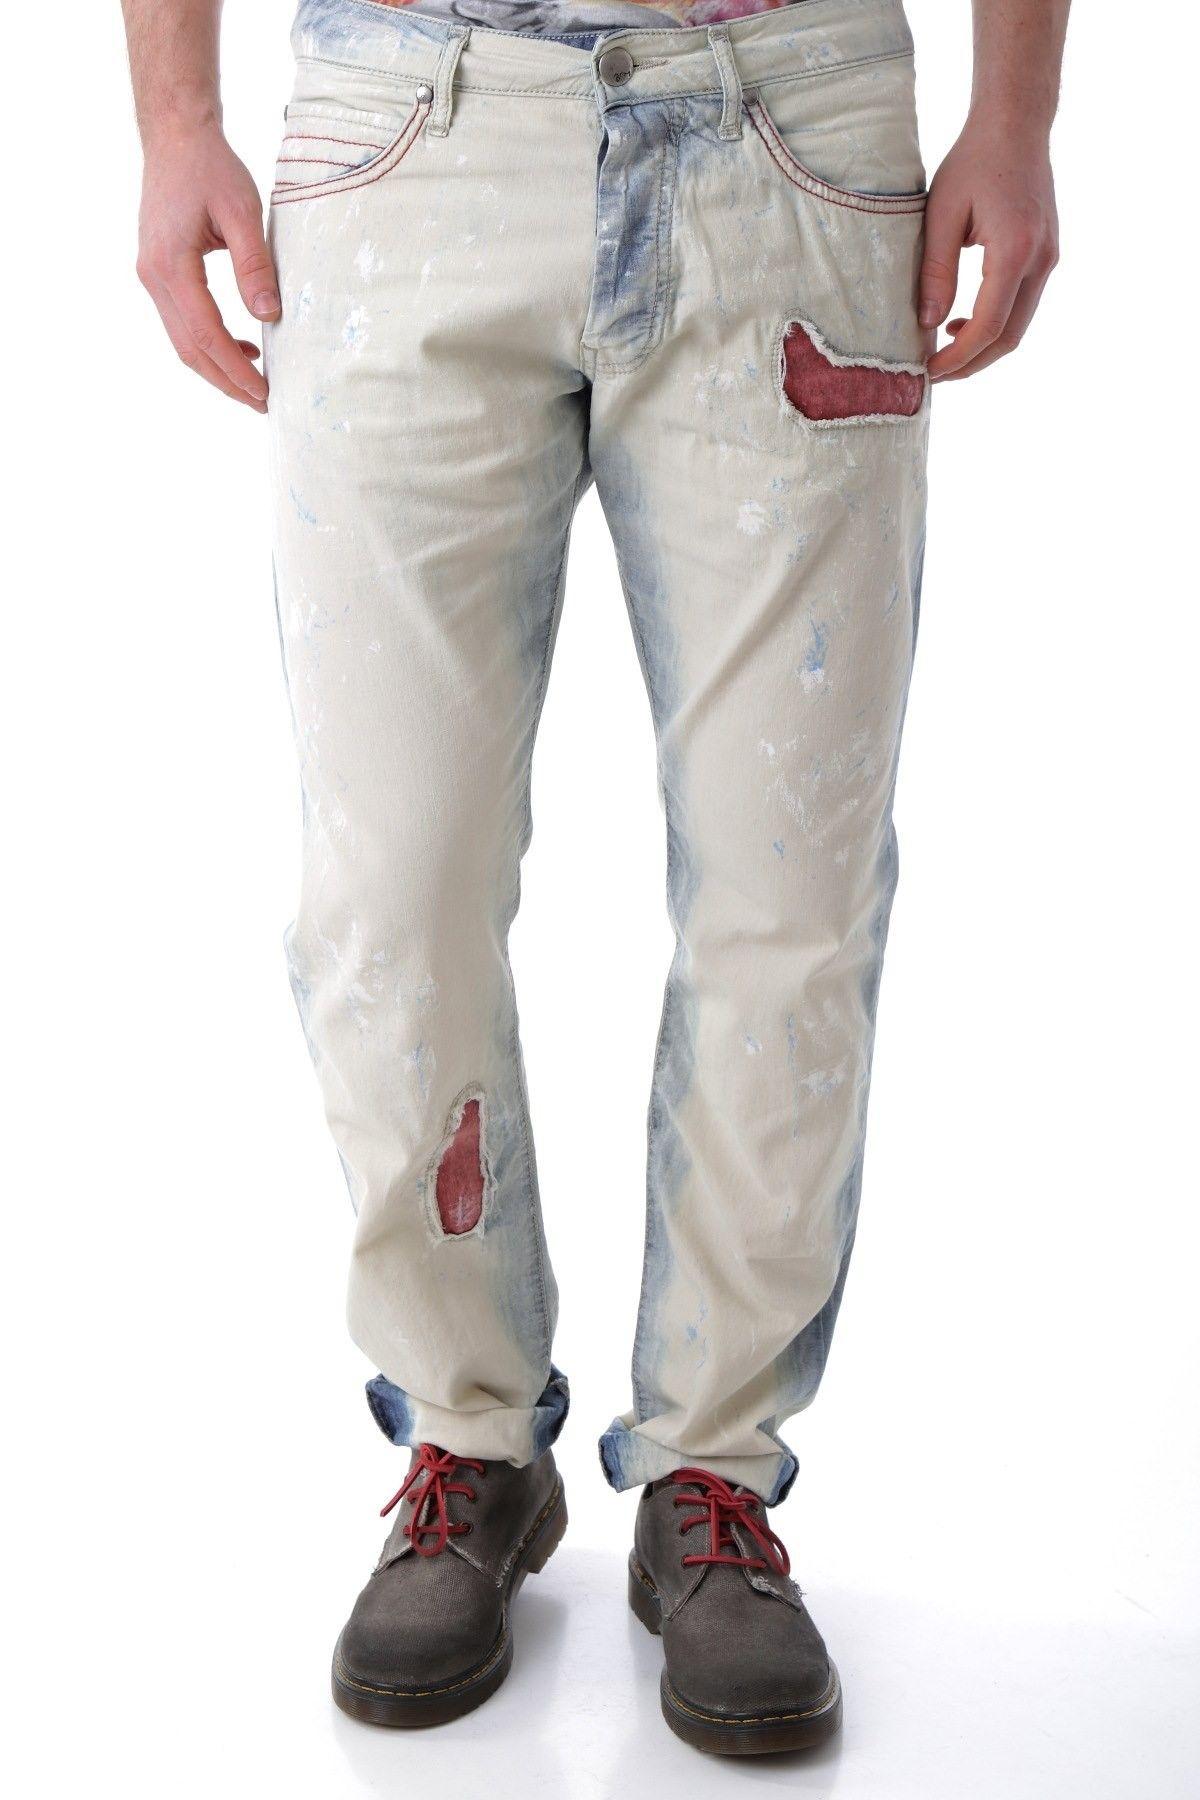 Bray Steve Alan Men's Jeans In Blue